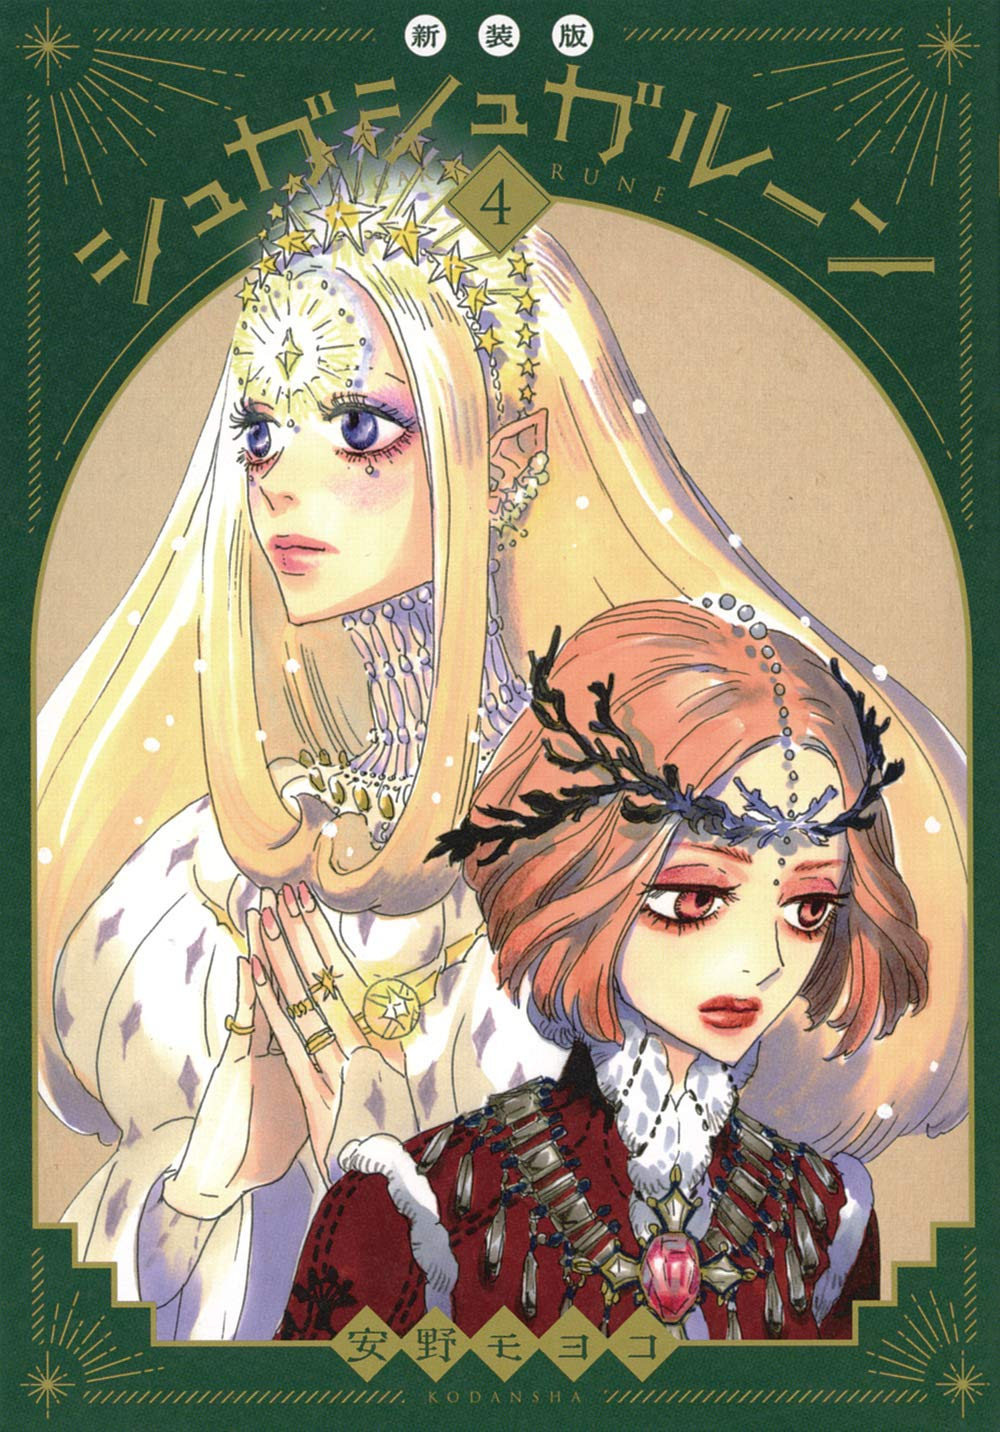 Sugar Sugar Rune Collection Art Book Anno Moyoko Manga Illustration  Japan NEW